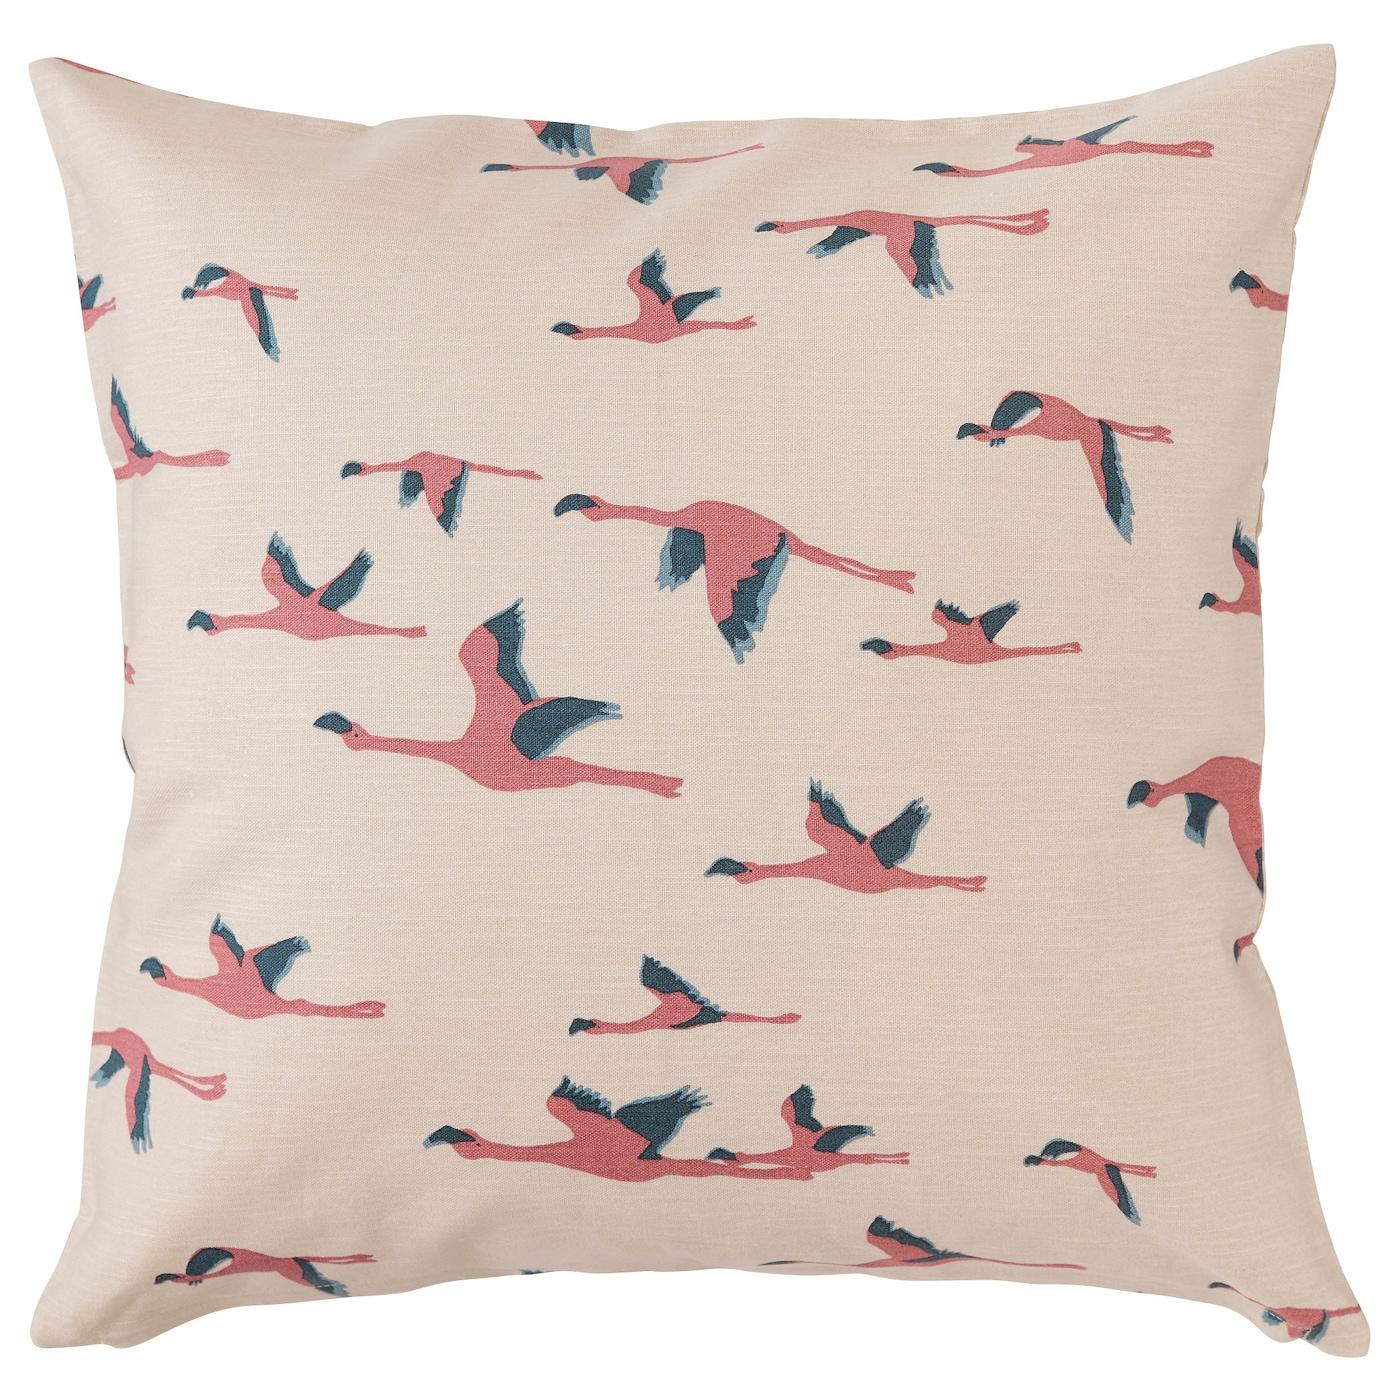 Textiles & Home Textiles